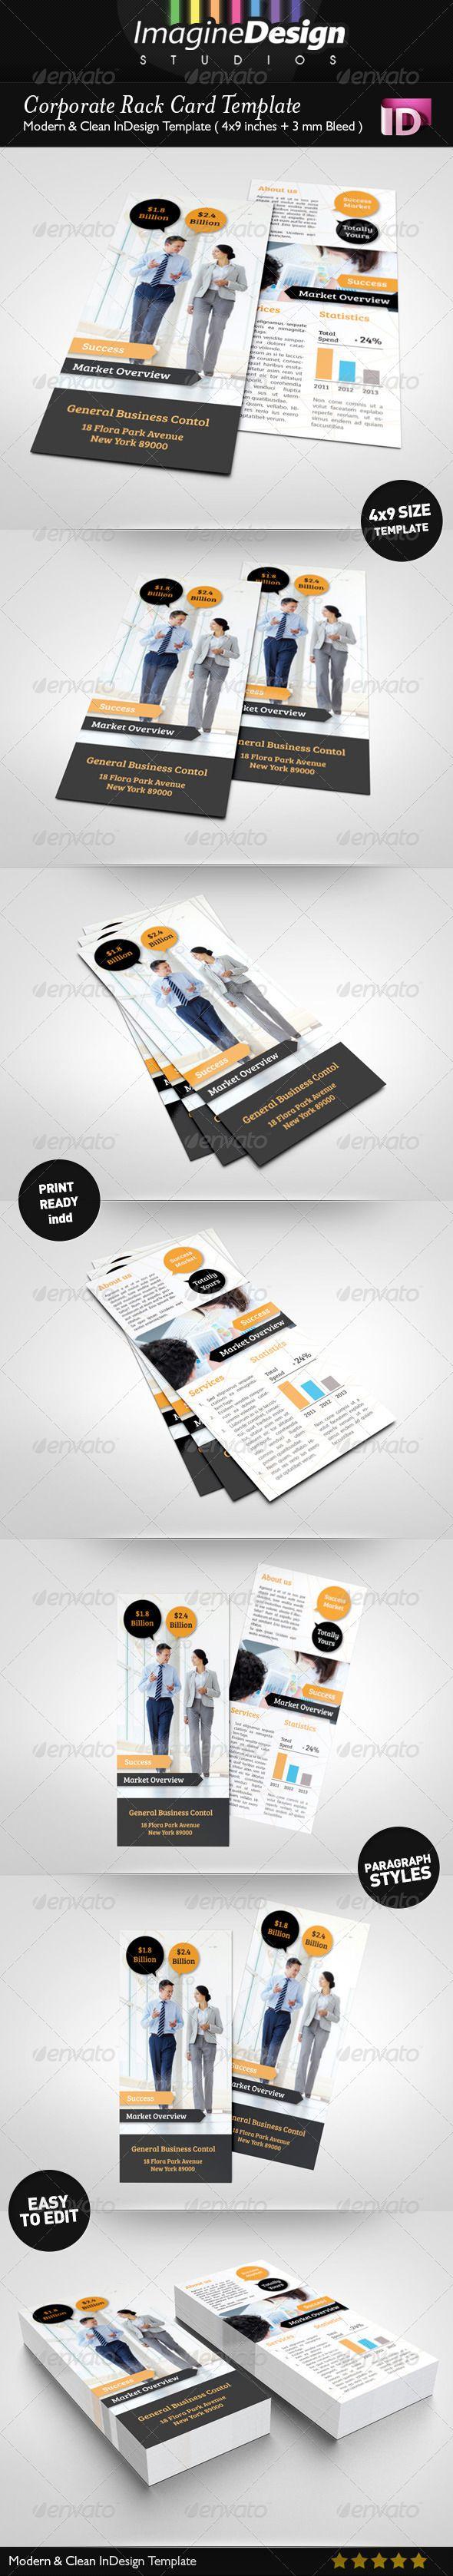 rack card template microsoft word